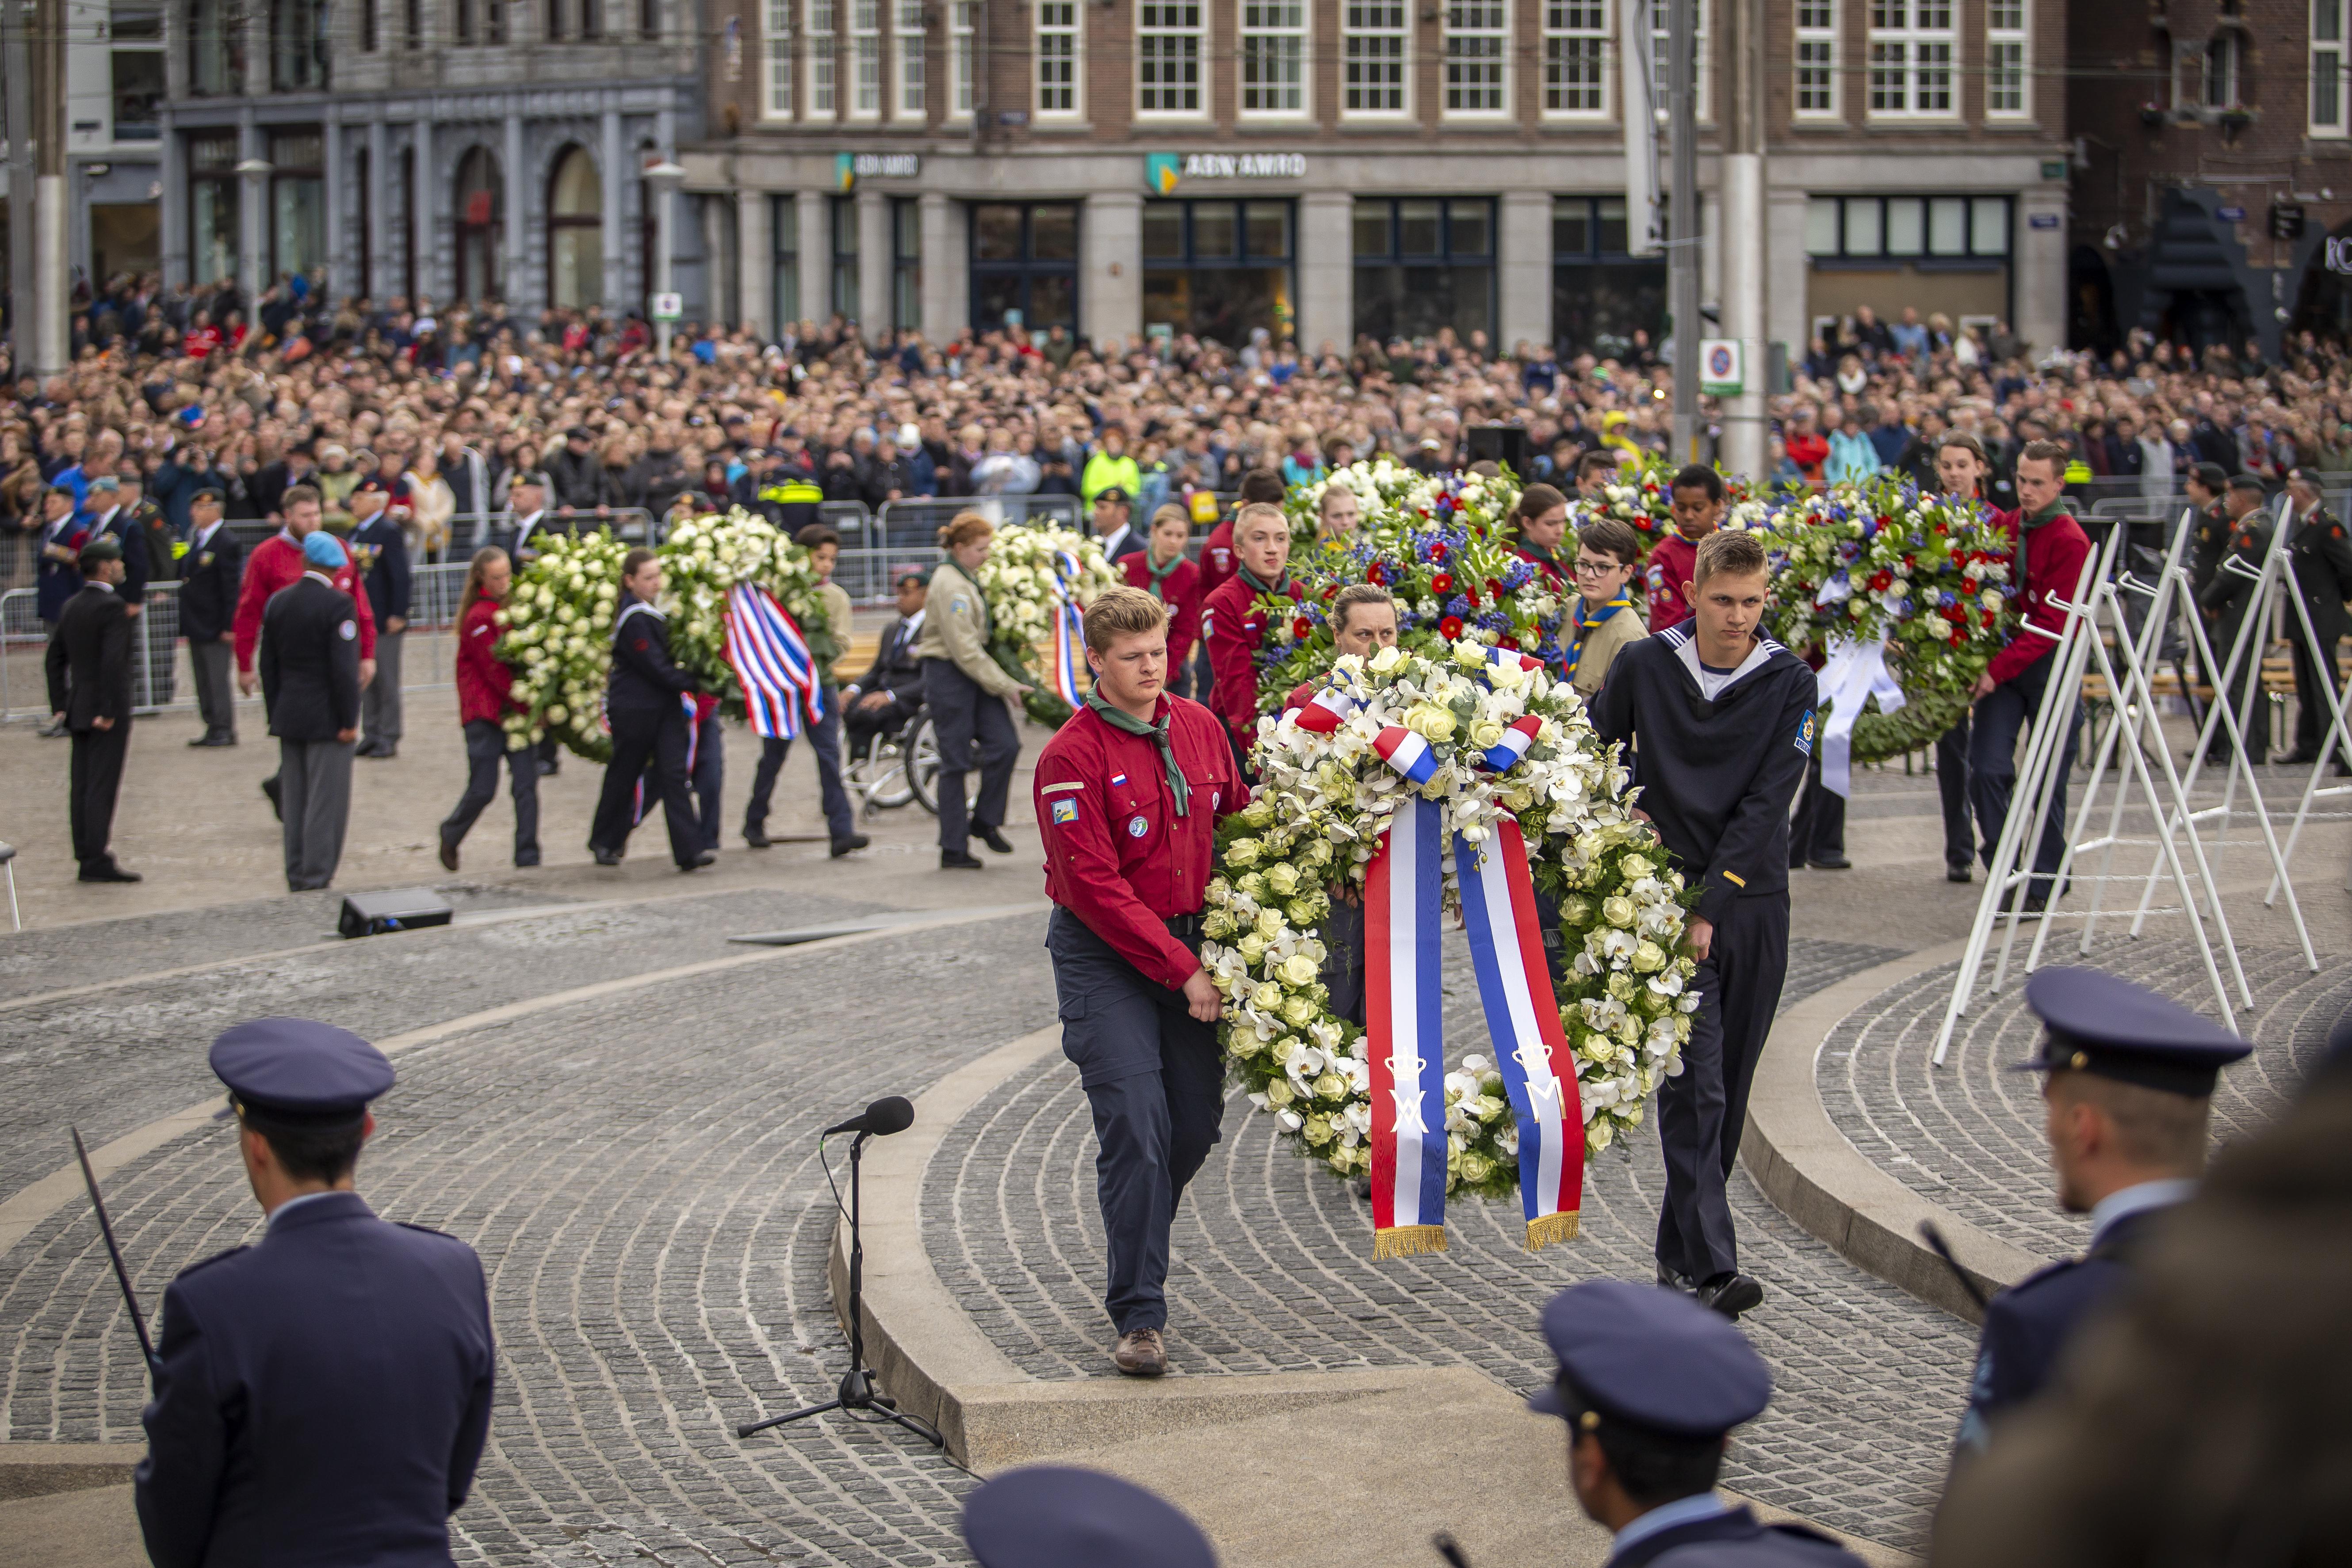 Zeekadetkorps Nederland, 4 mei 2019, Dam Amsterdam